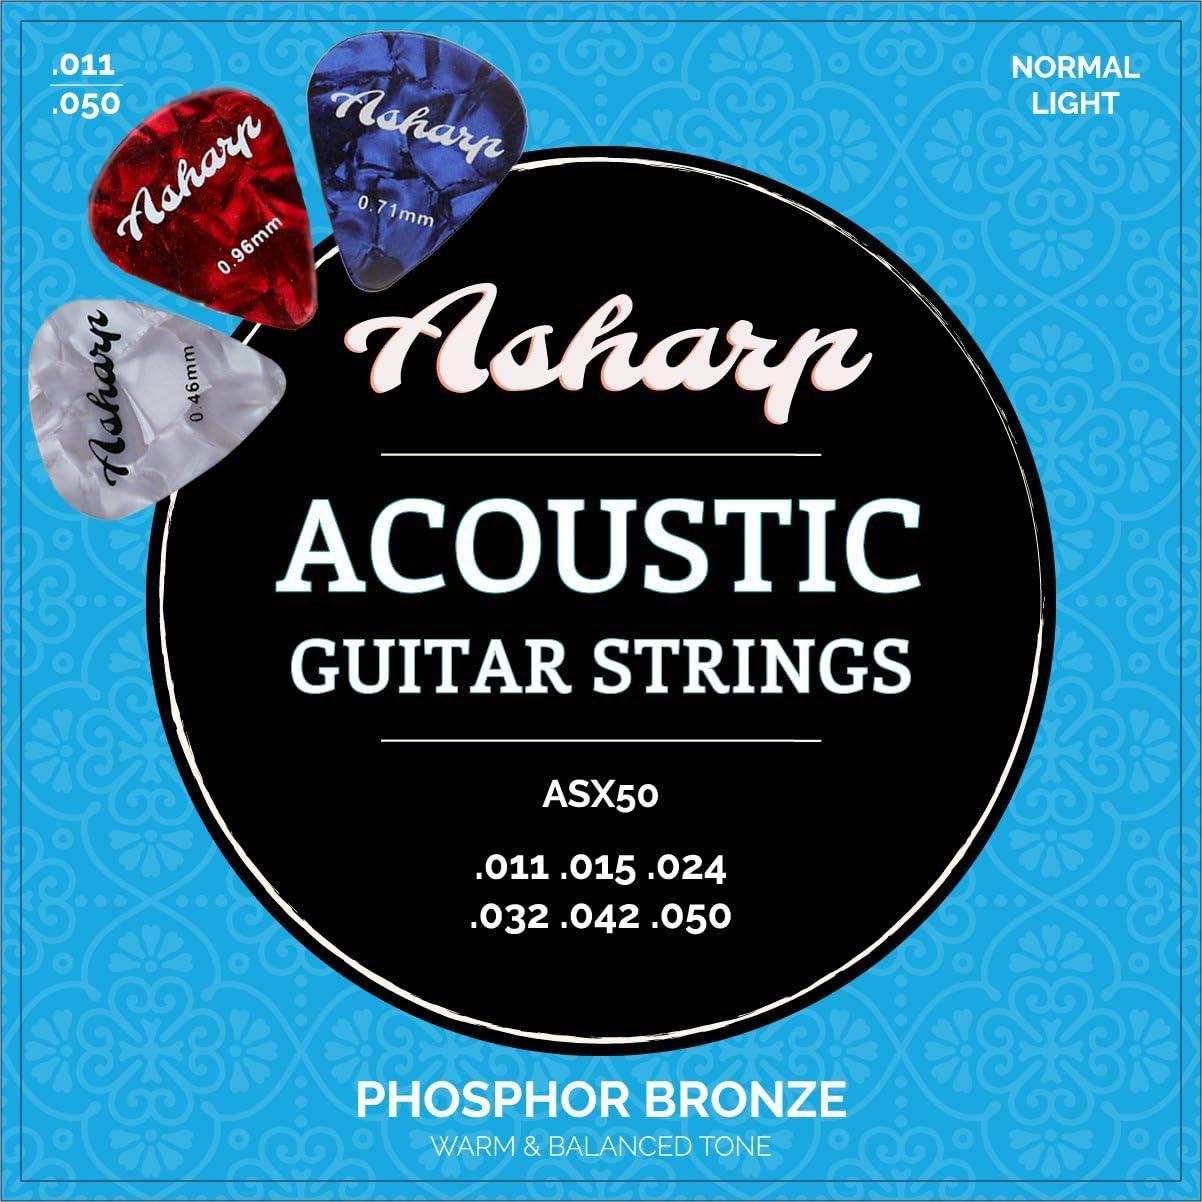 Asharp Cuerdas para guitarra acústica western, incluye 3púas, juego de cuerdas de acero premium para guitarra acústica